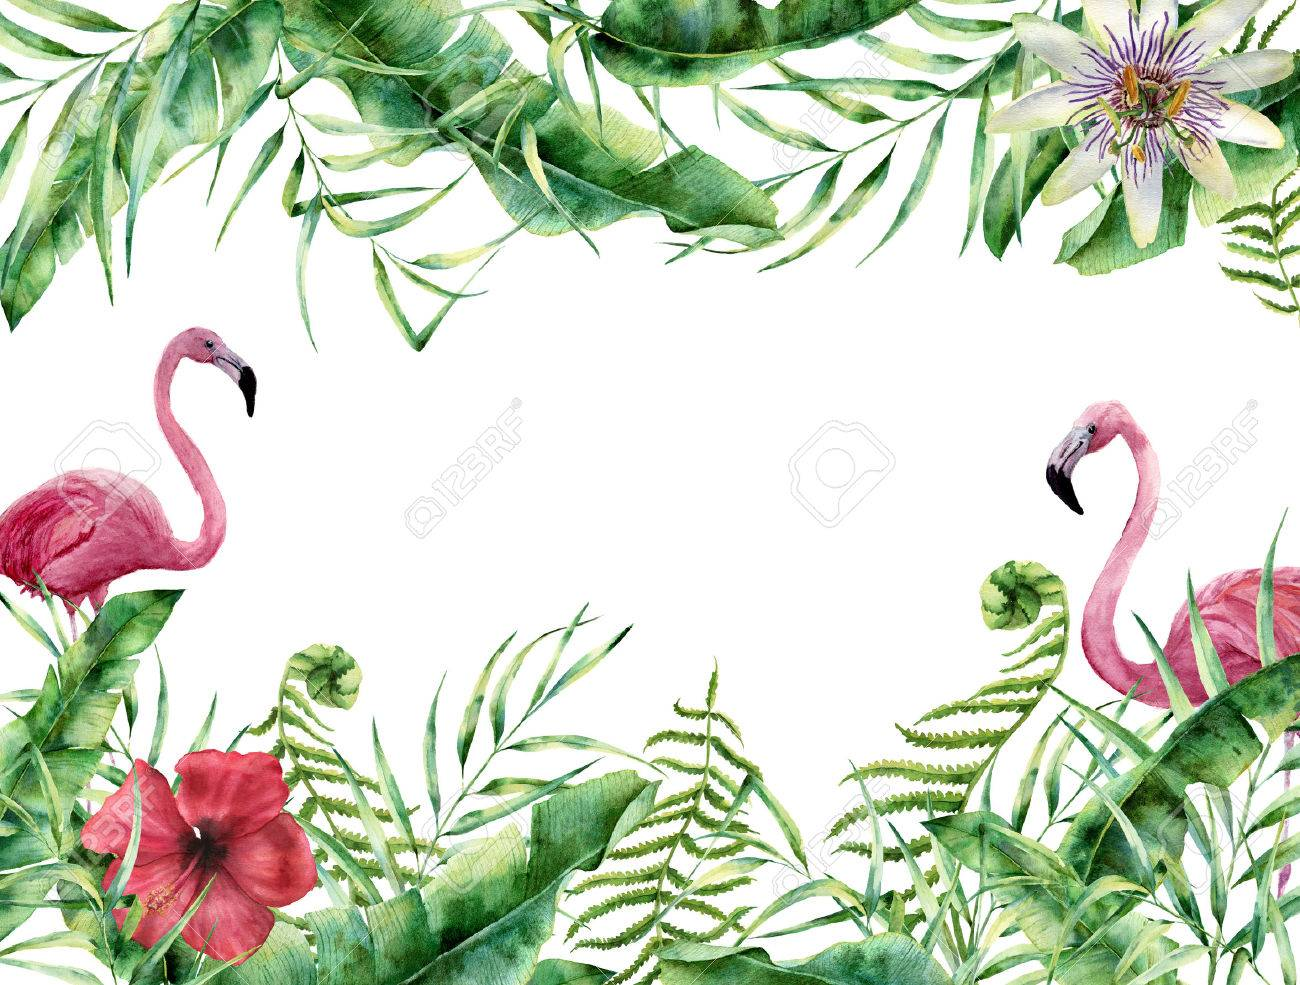 Aquarell Tropische Blumenkarte Mit Flamingo Hand Bemalte Sommer